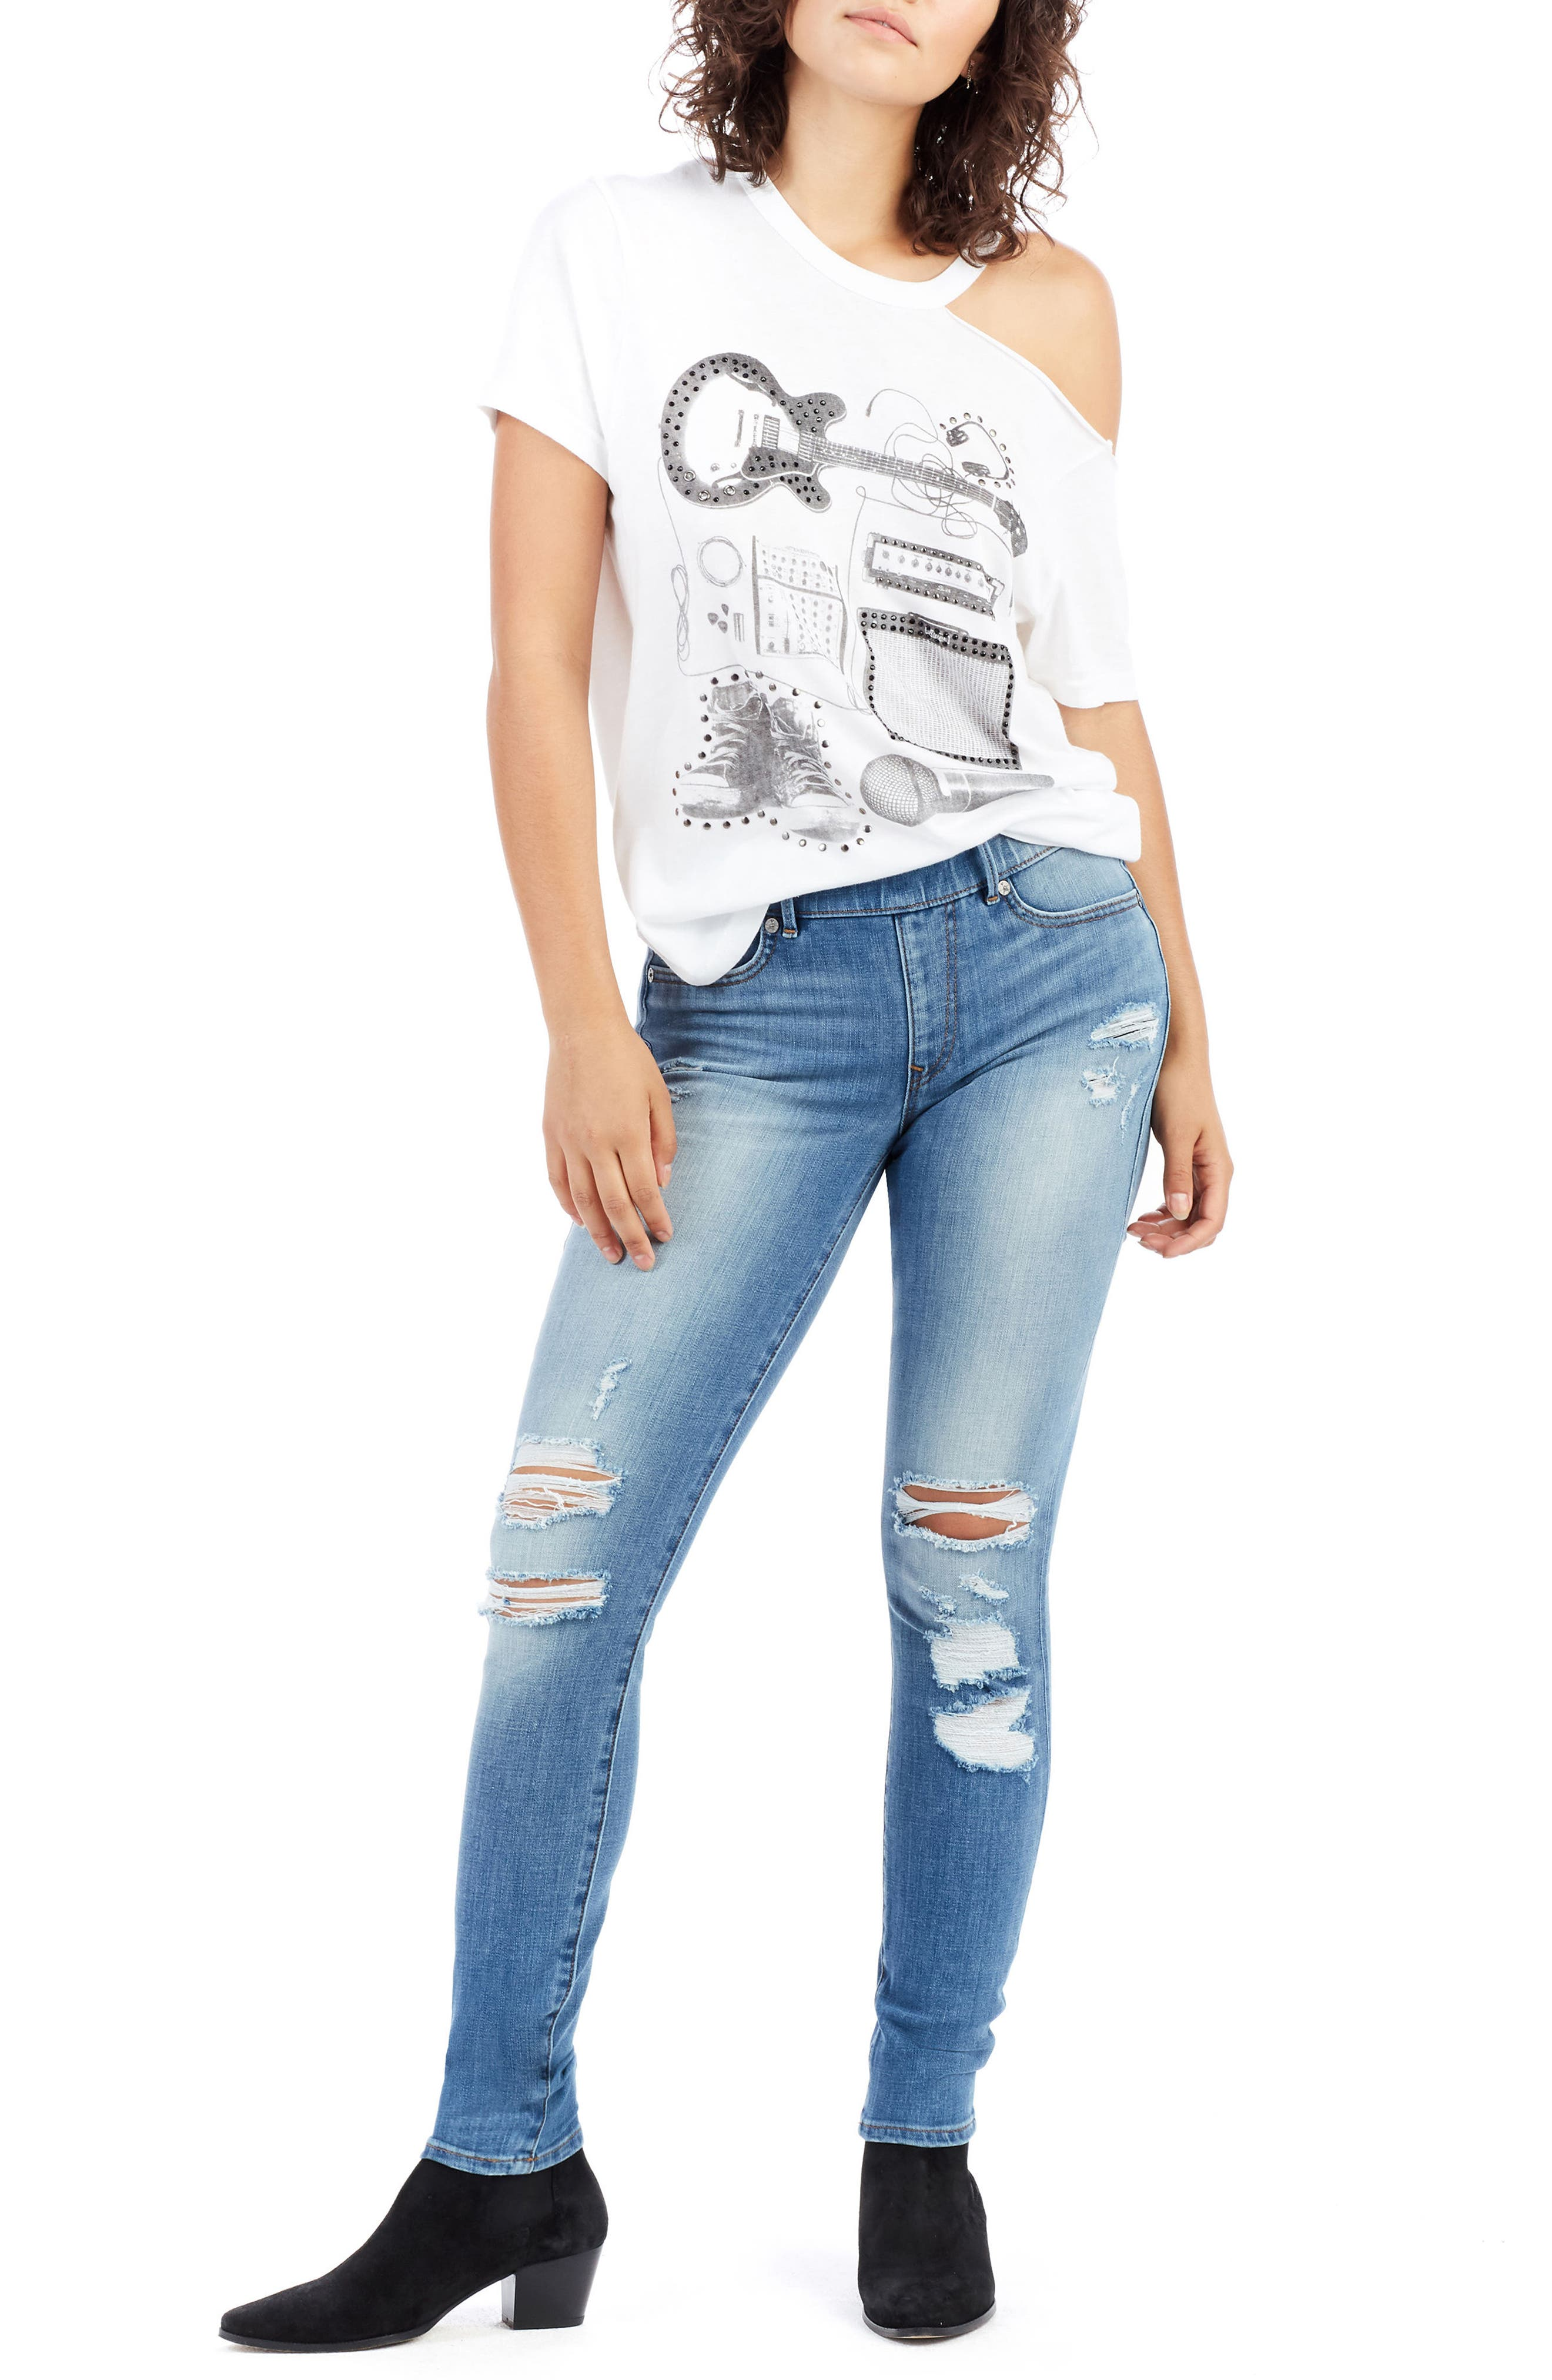 Jennie Runway Curvy Skinny Jeans,                             Alternate thumbnail 7, color,                             400